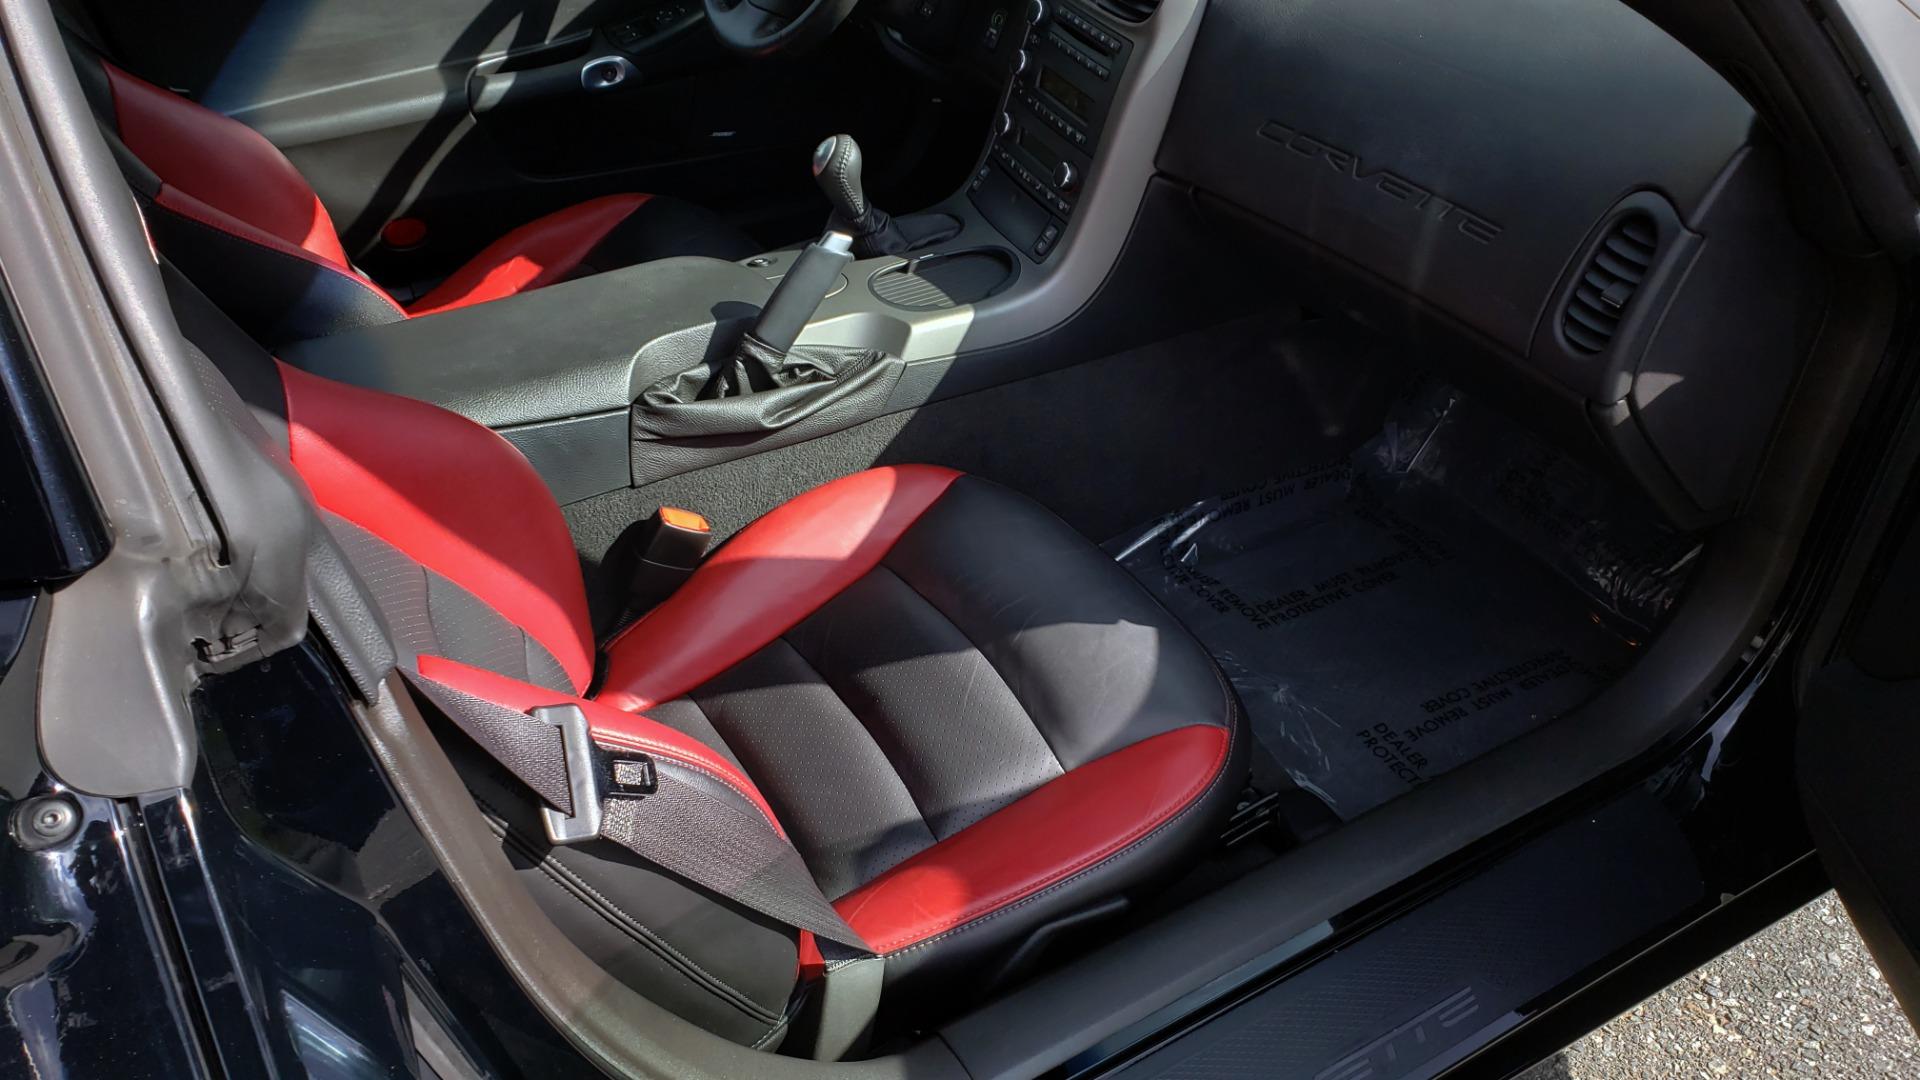 Used 2007 Chevrolet CORVETTE Z06 2LZ / 7.0L 427 V8 / 6-SPD MAN / BOSE / POLISHED WHEELS for sale Sold at Formula Imports in Charlotte NC 28227 22